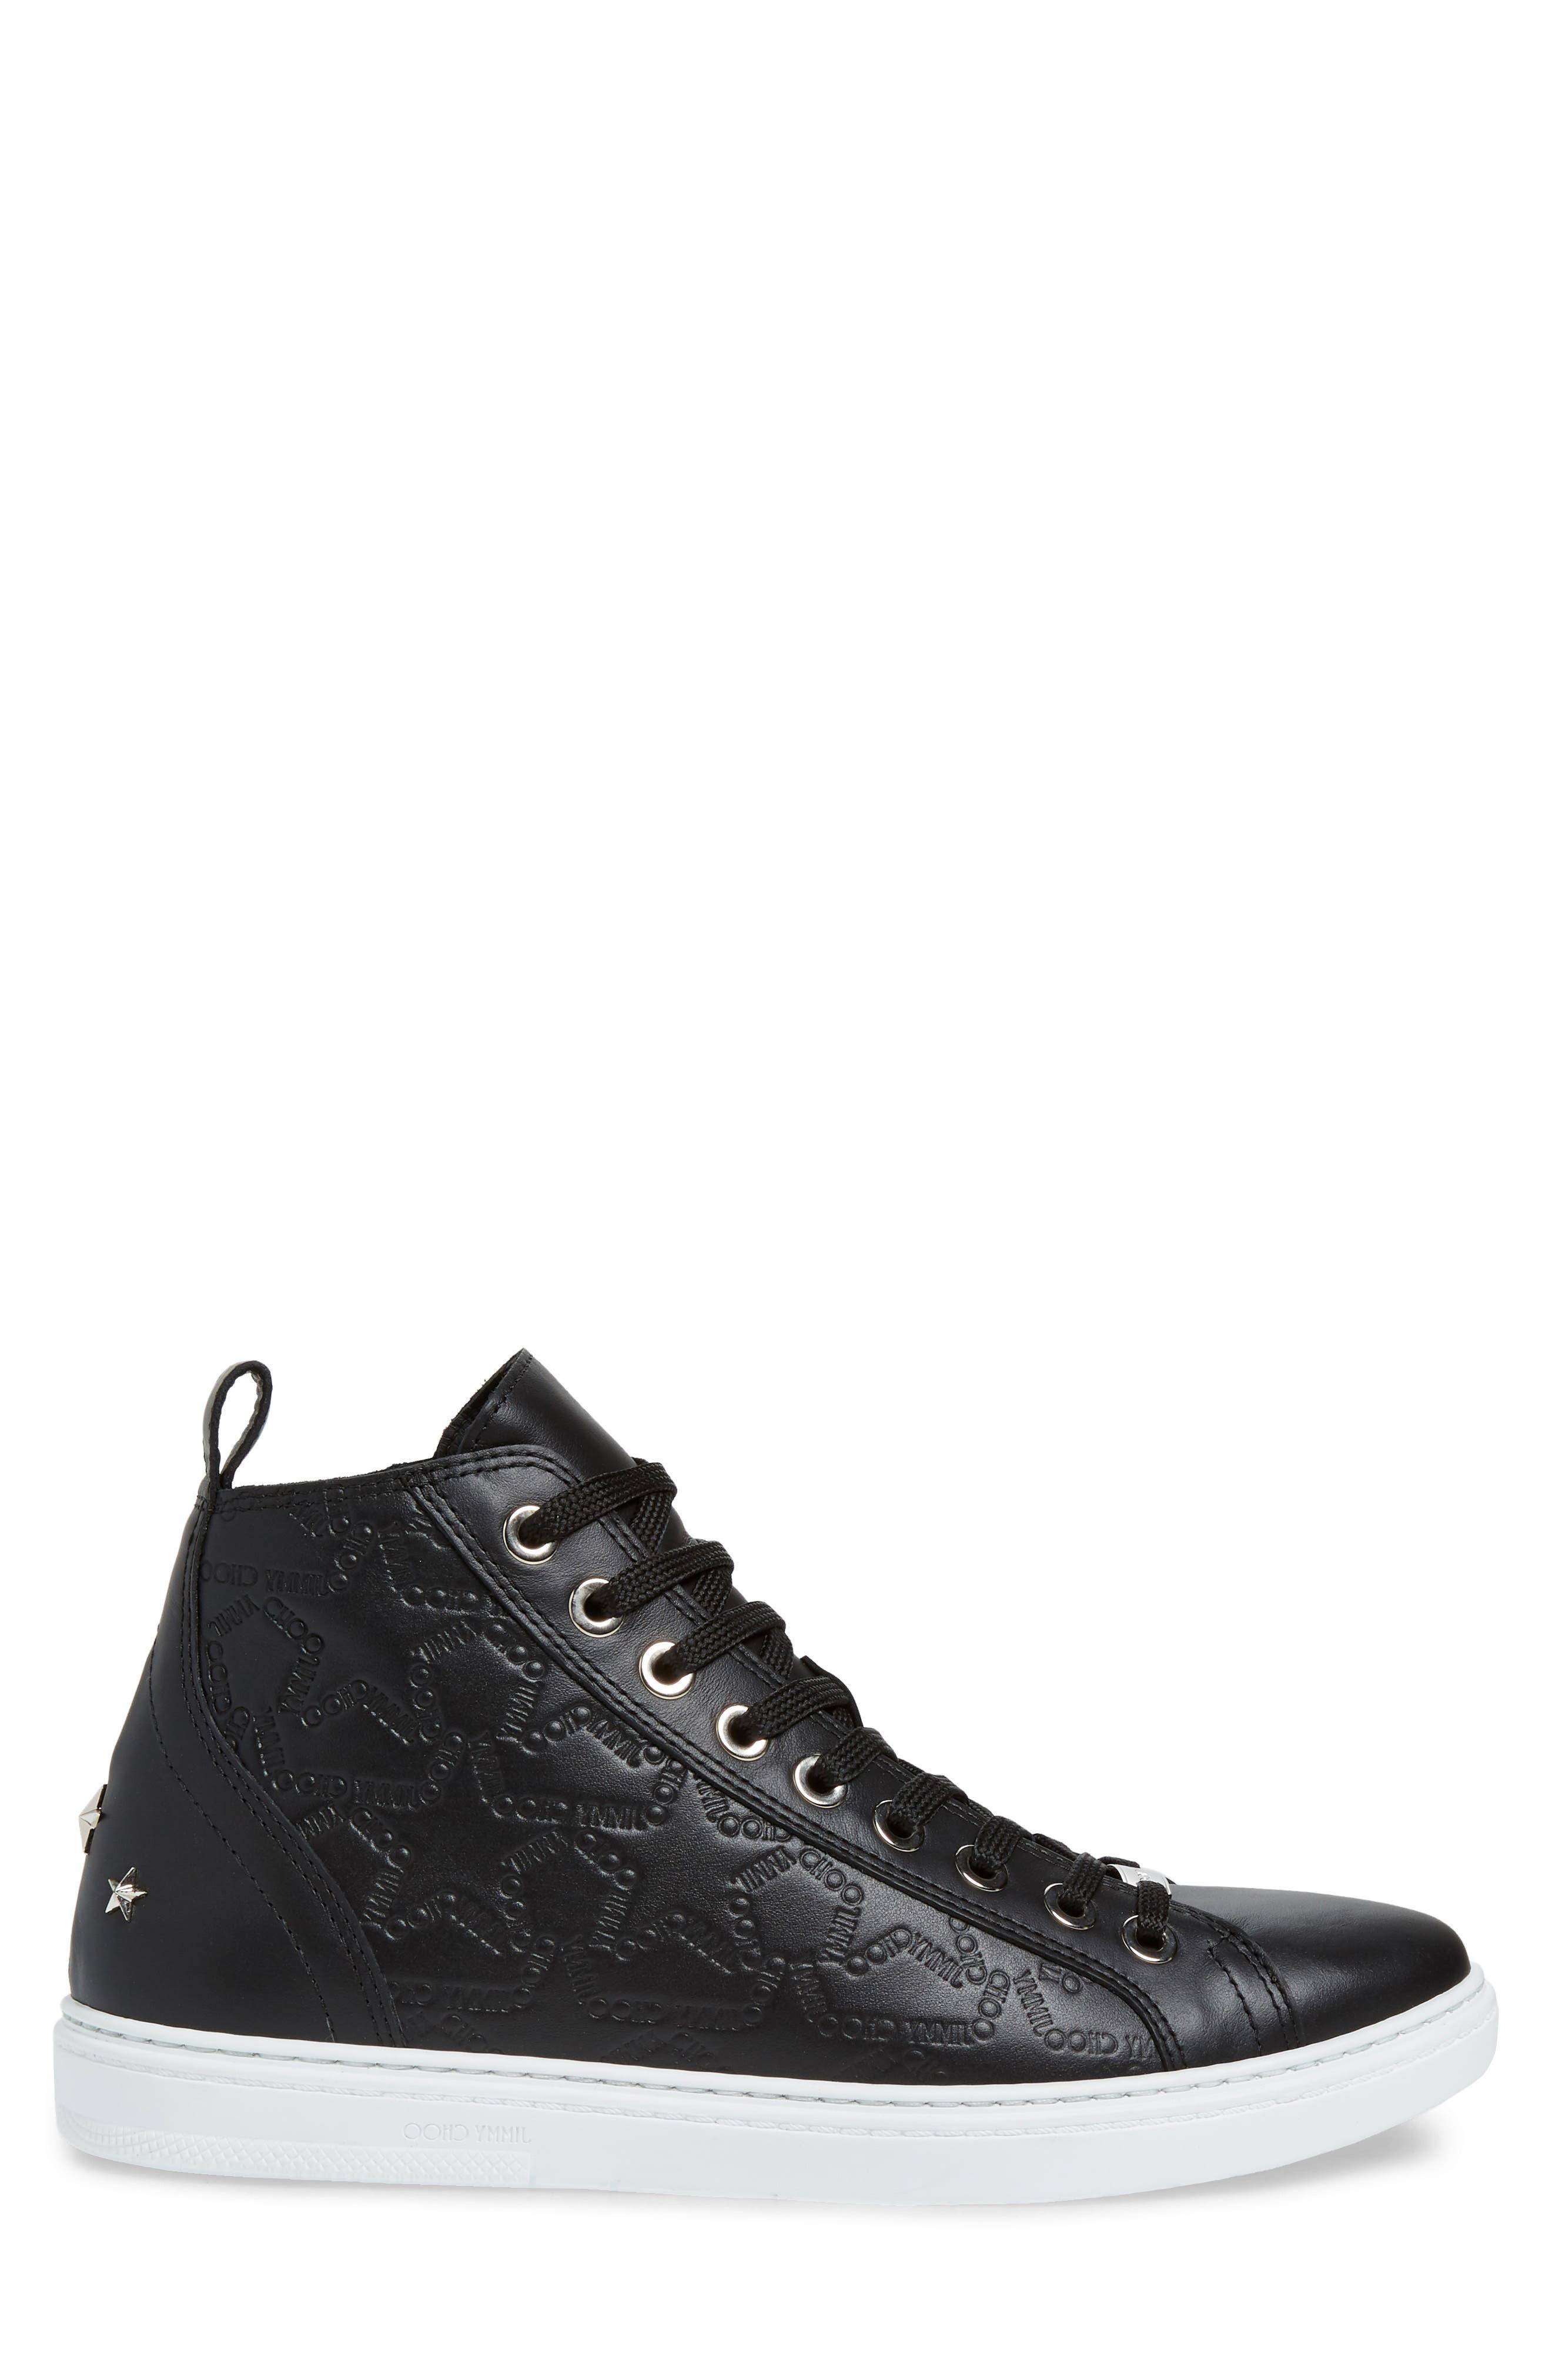 Colt High Top Sneaker,                             Alternate thumbnail 3, color,                             001